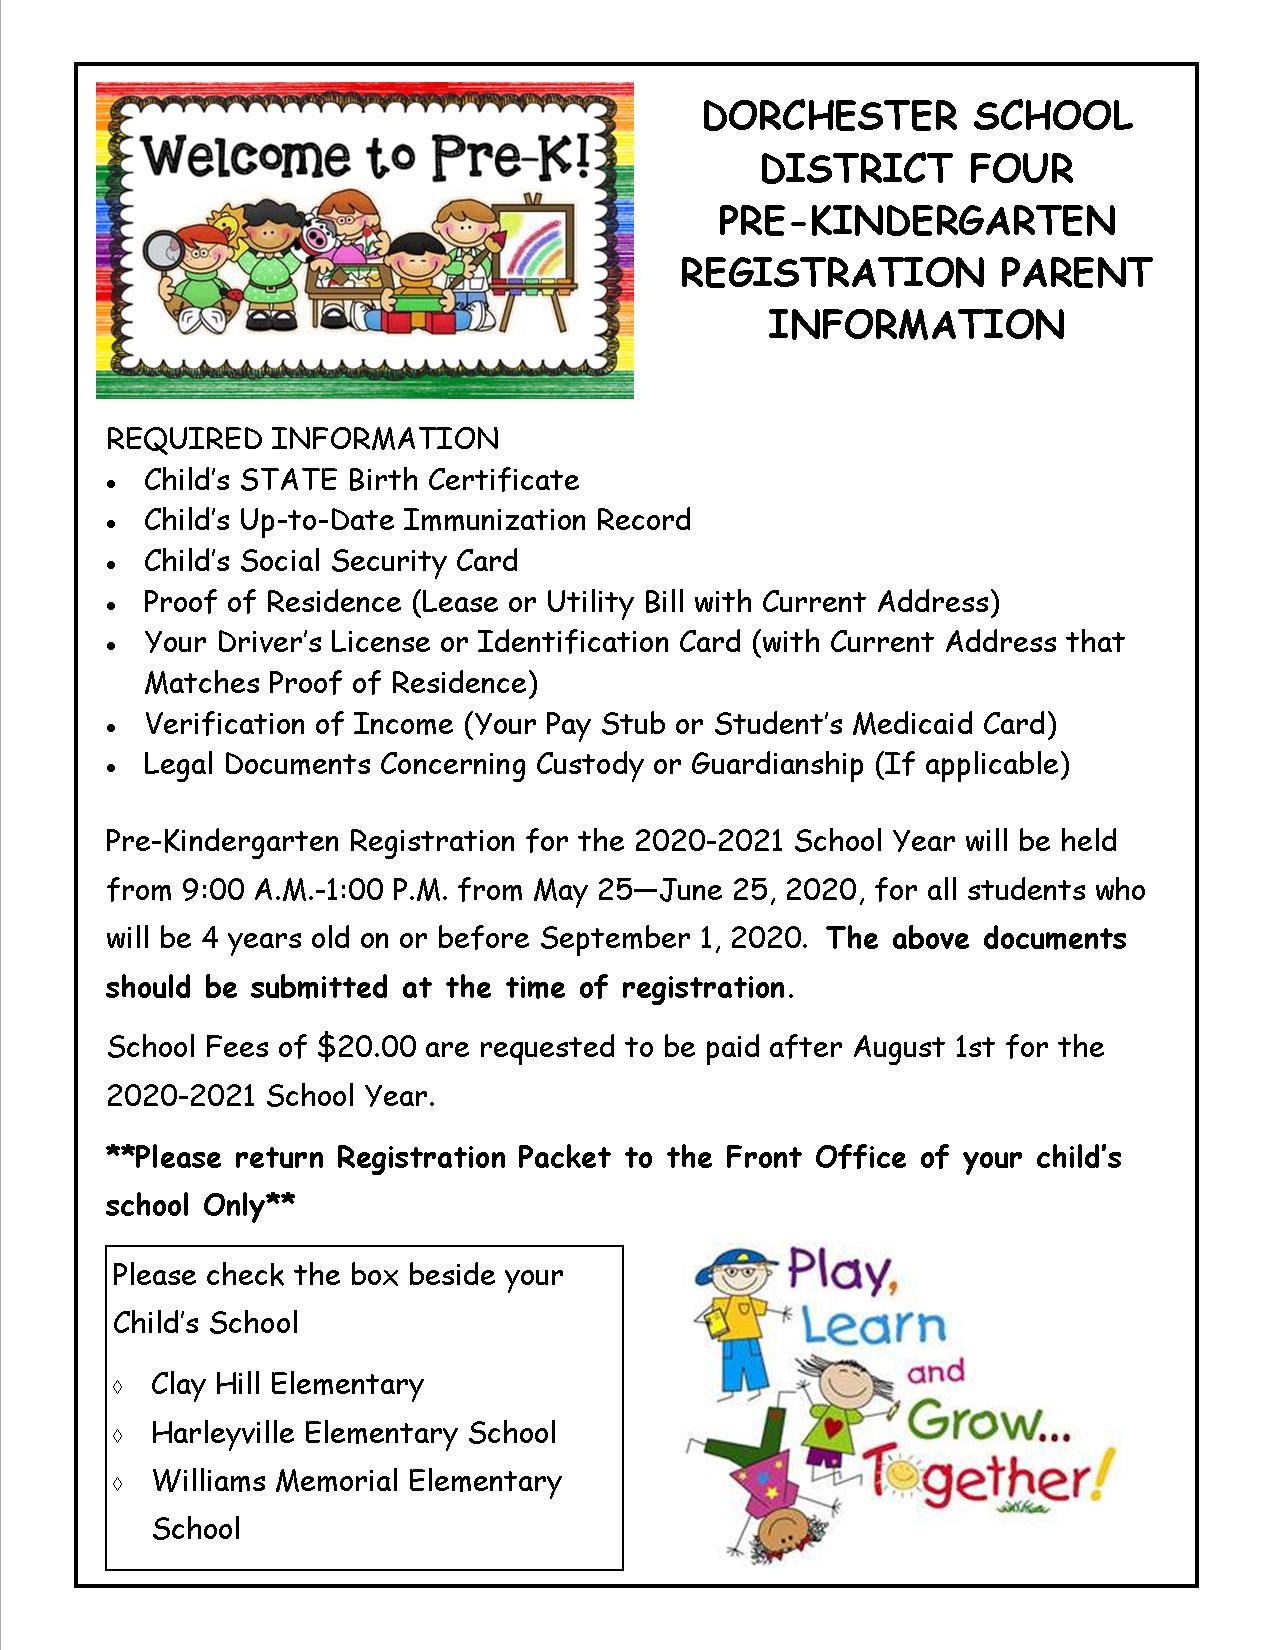 Home – Harleyville Elementary School Within Dorchester County School District 02 Calendar